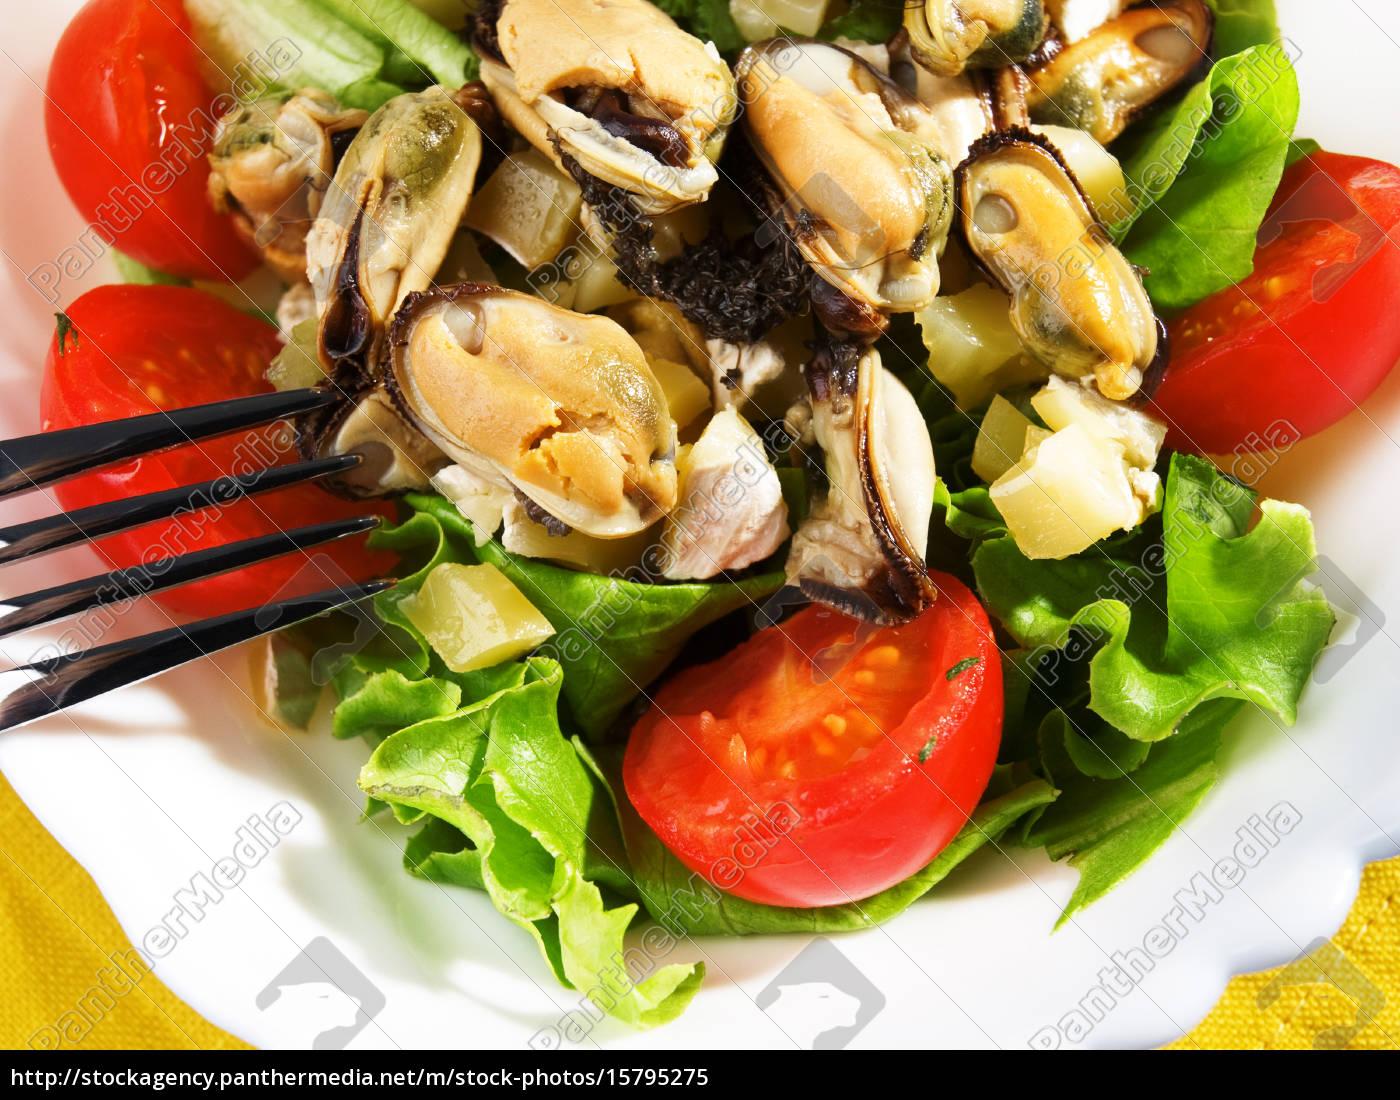 seafood, salad, seafood, salad, seafood, salad, seafood, salad - 15795275